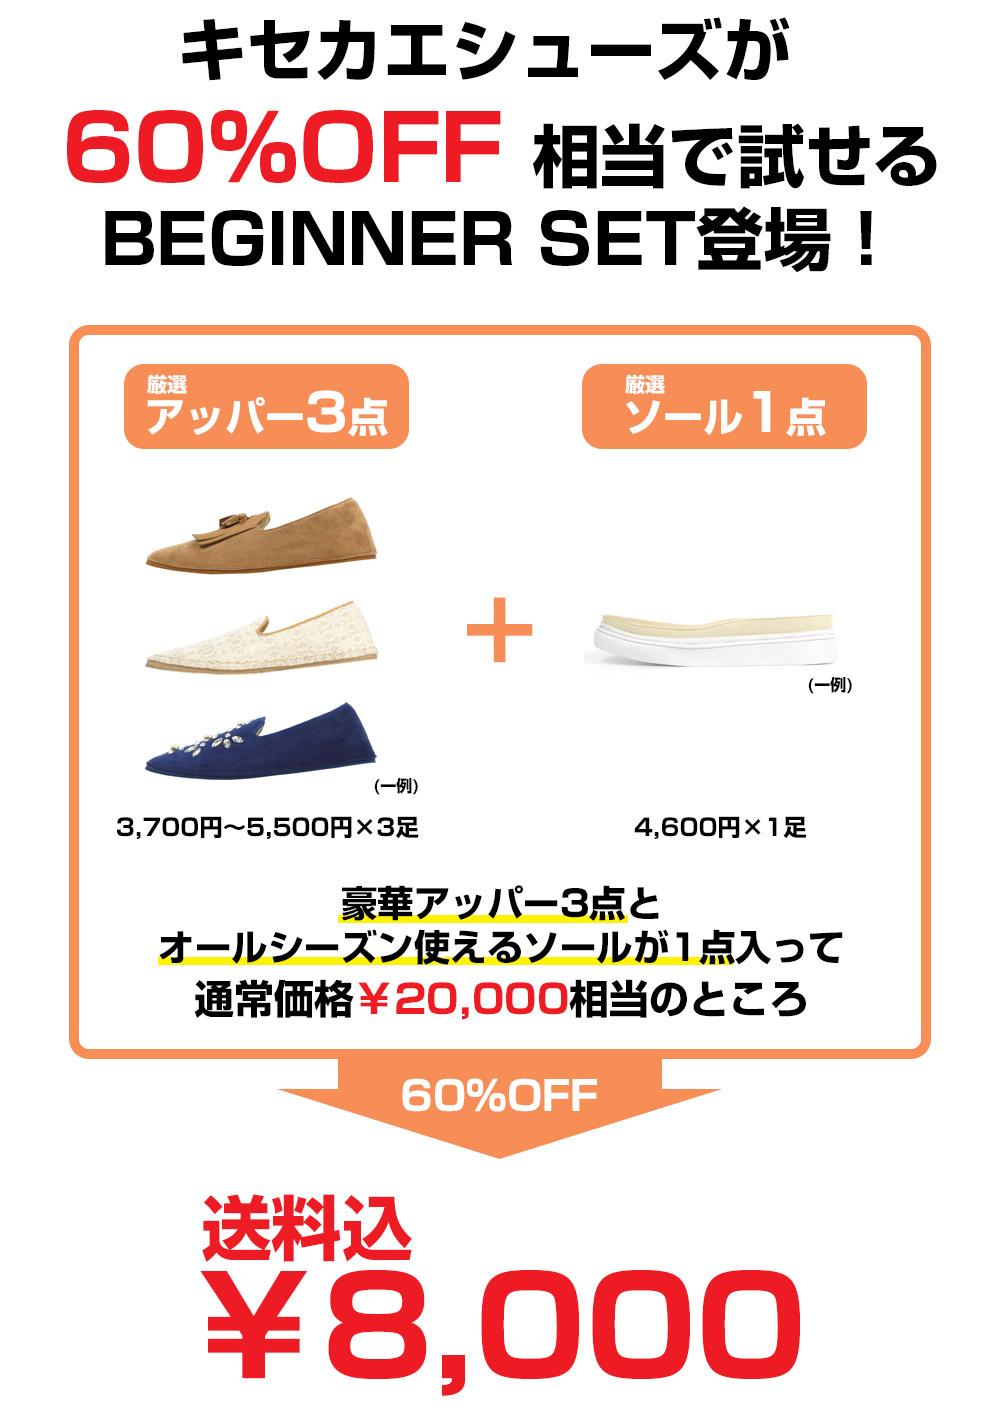 【BEGINNER SET】 厳選アッパー3足+ソール1足